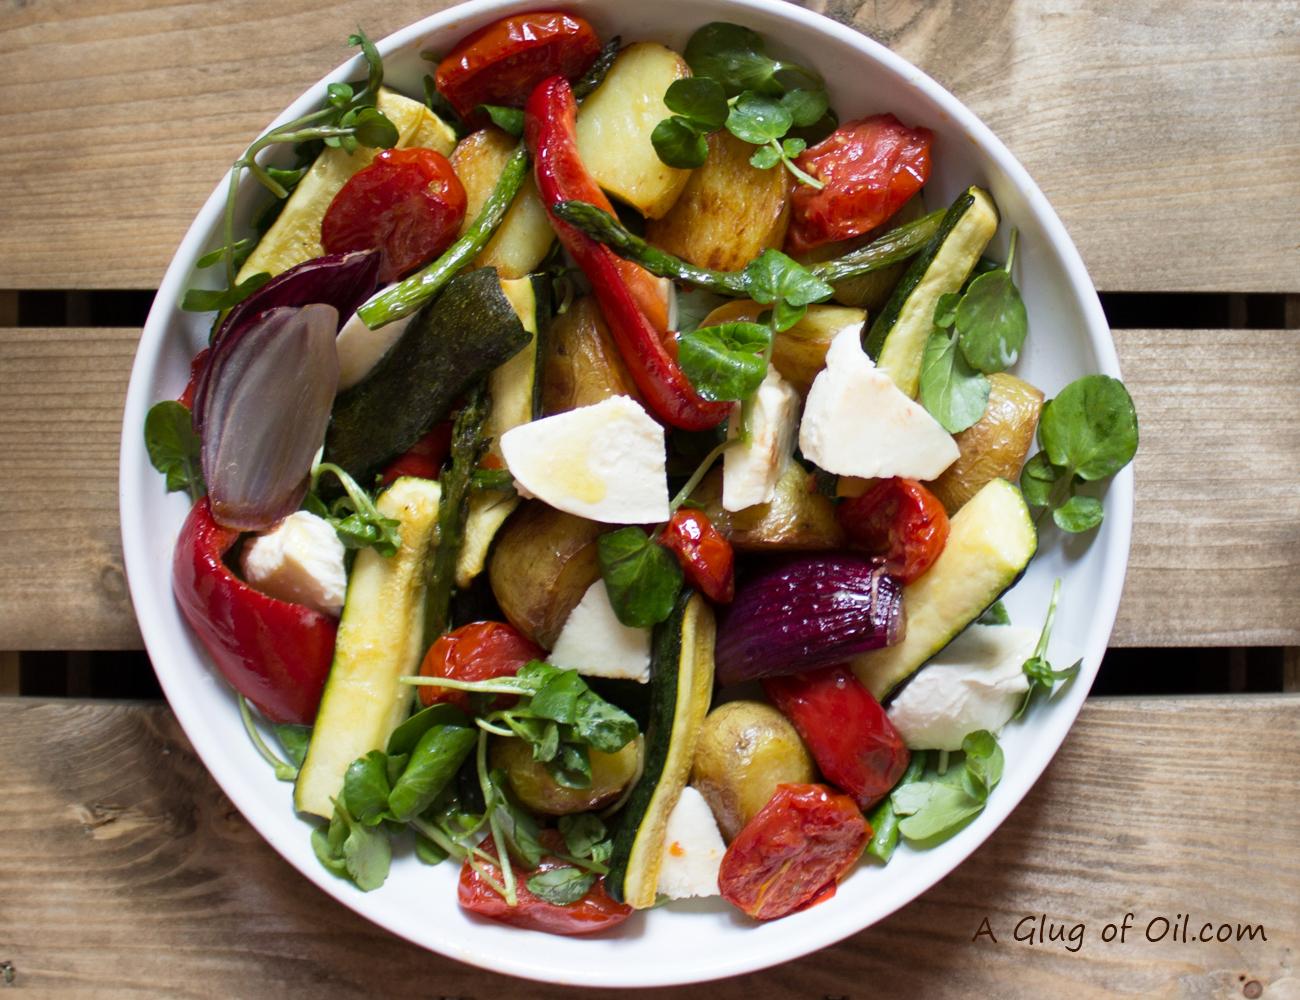 tomato and potato relationship tips